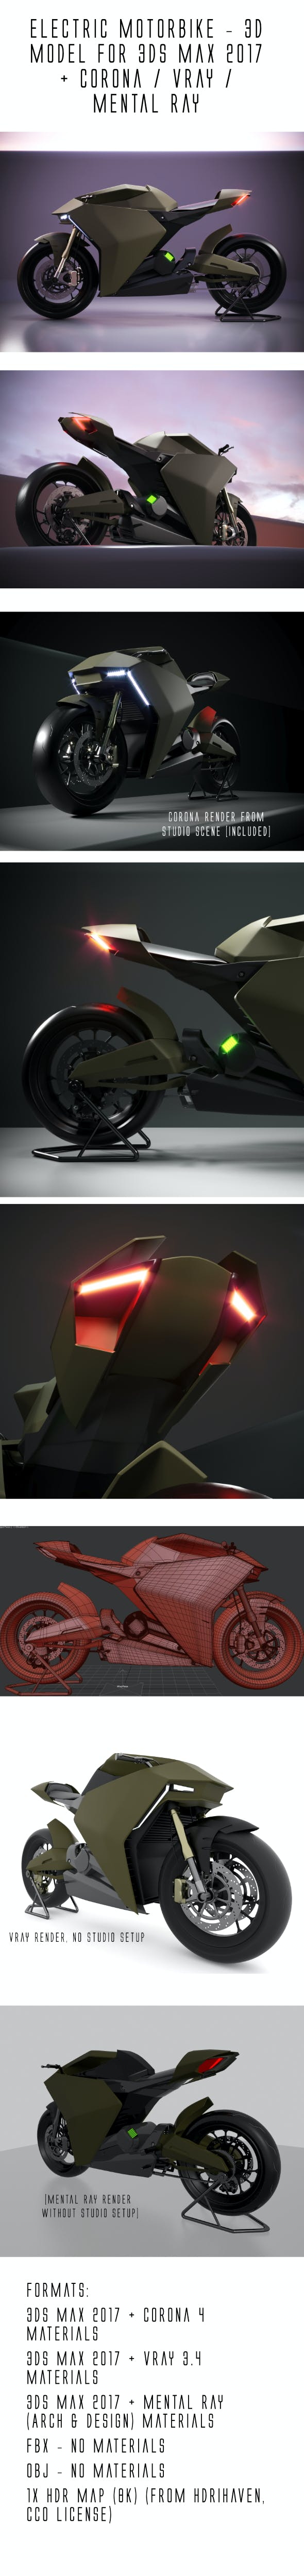 Ducati Zero electric motorcycle concept - 3DOcean Item for Sale